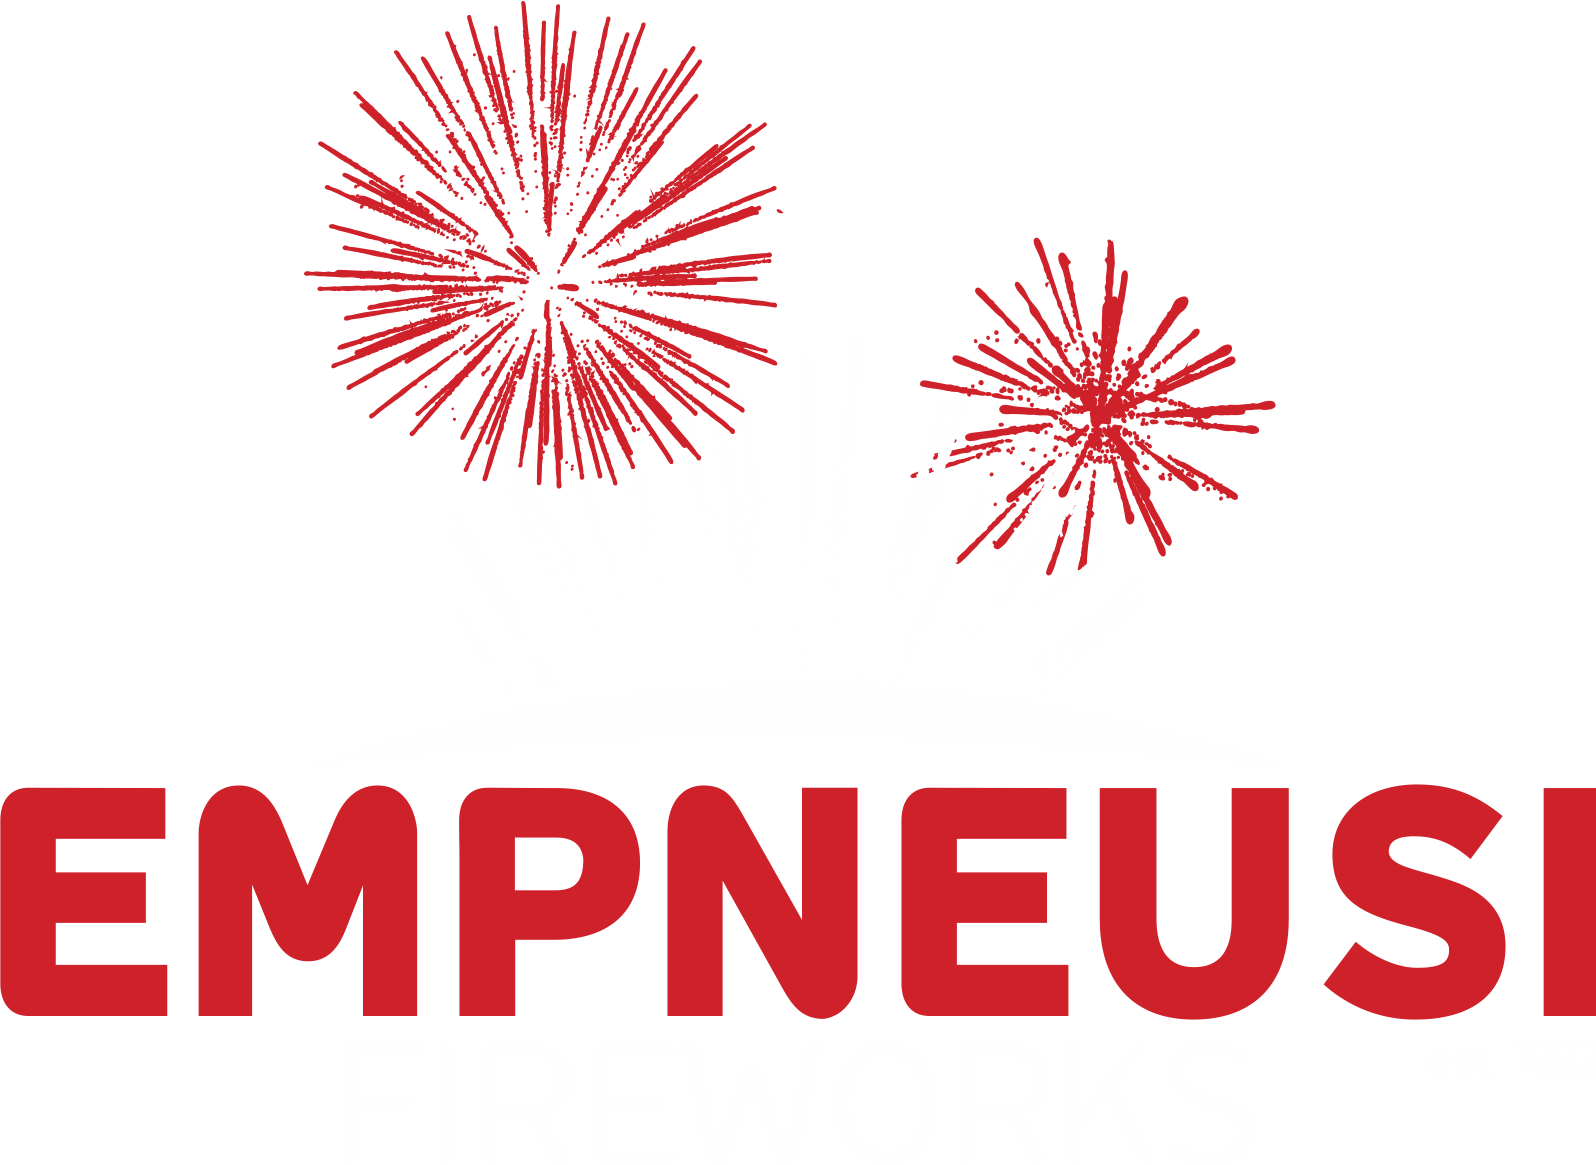 Empneusi Fireworks